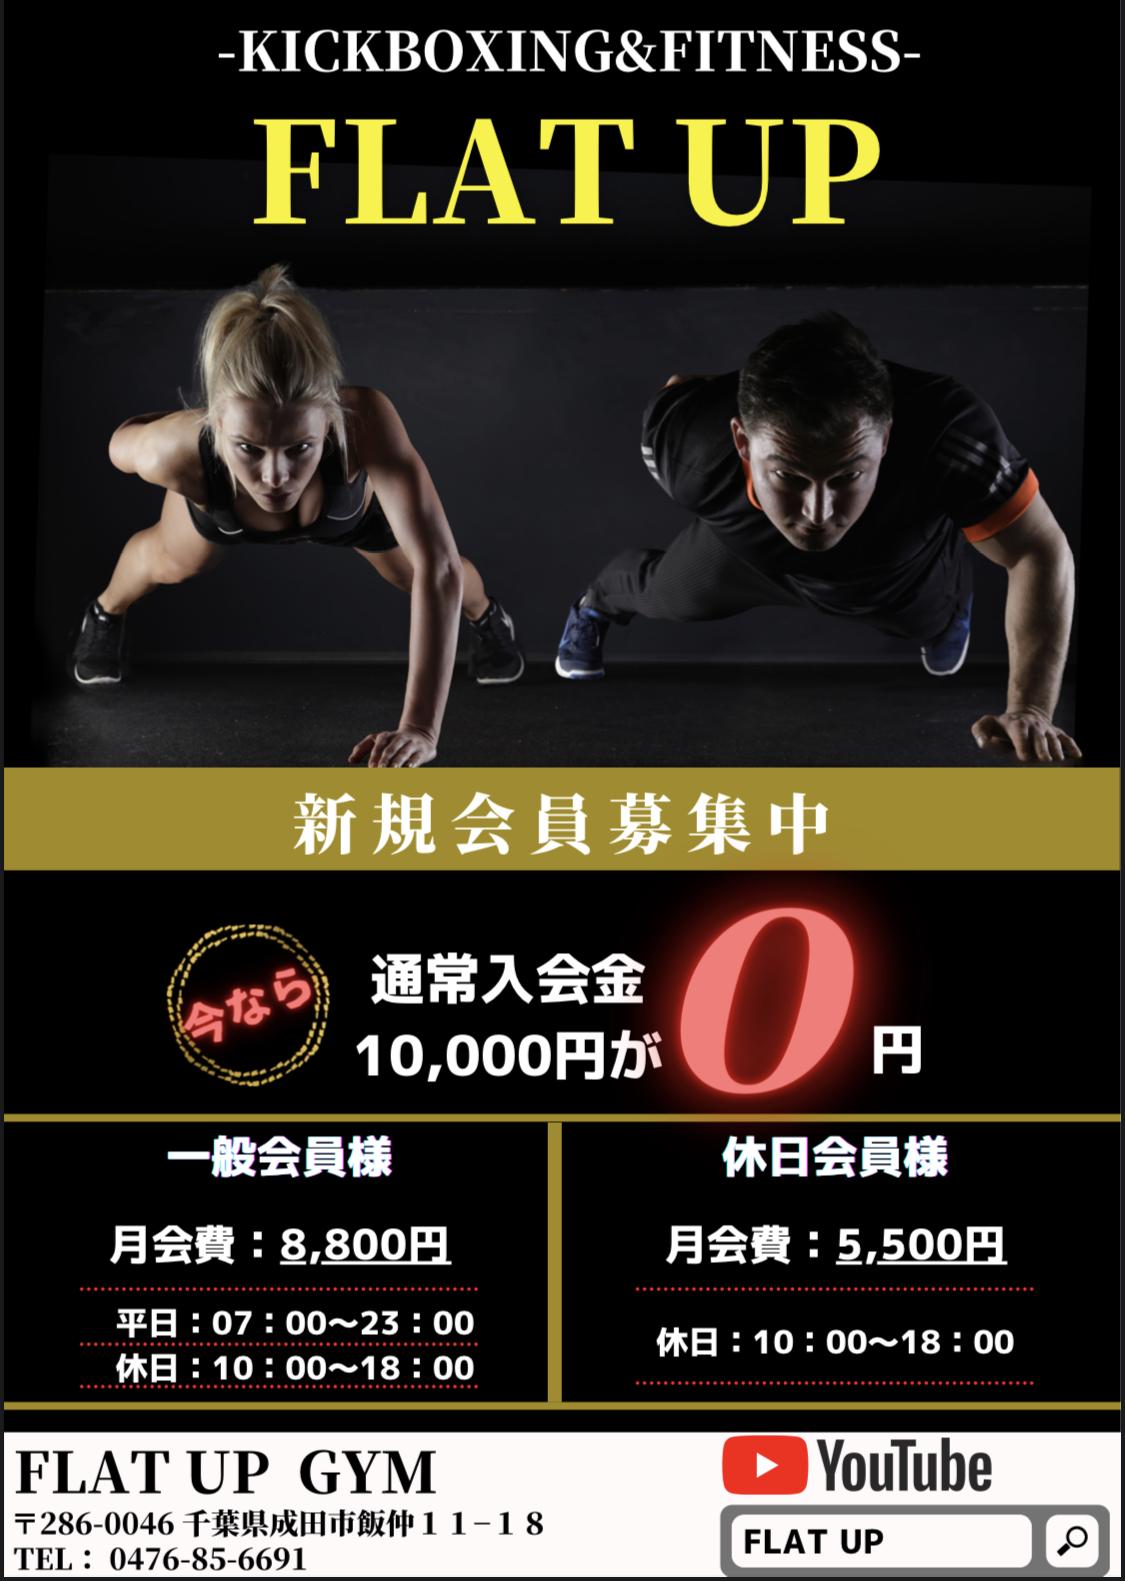 FLATUP GYM-千葉県成田市のキックボクシングジム